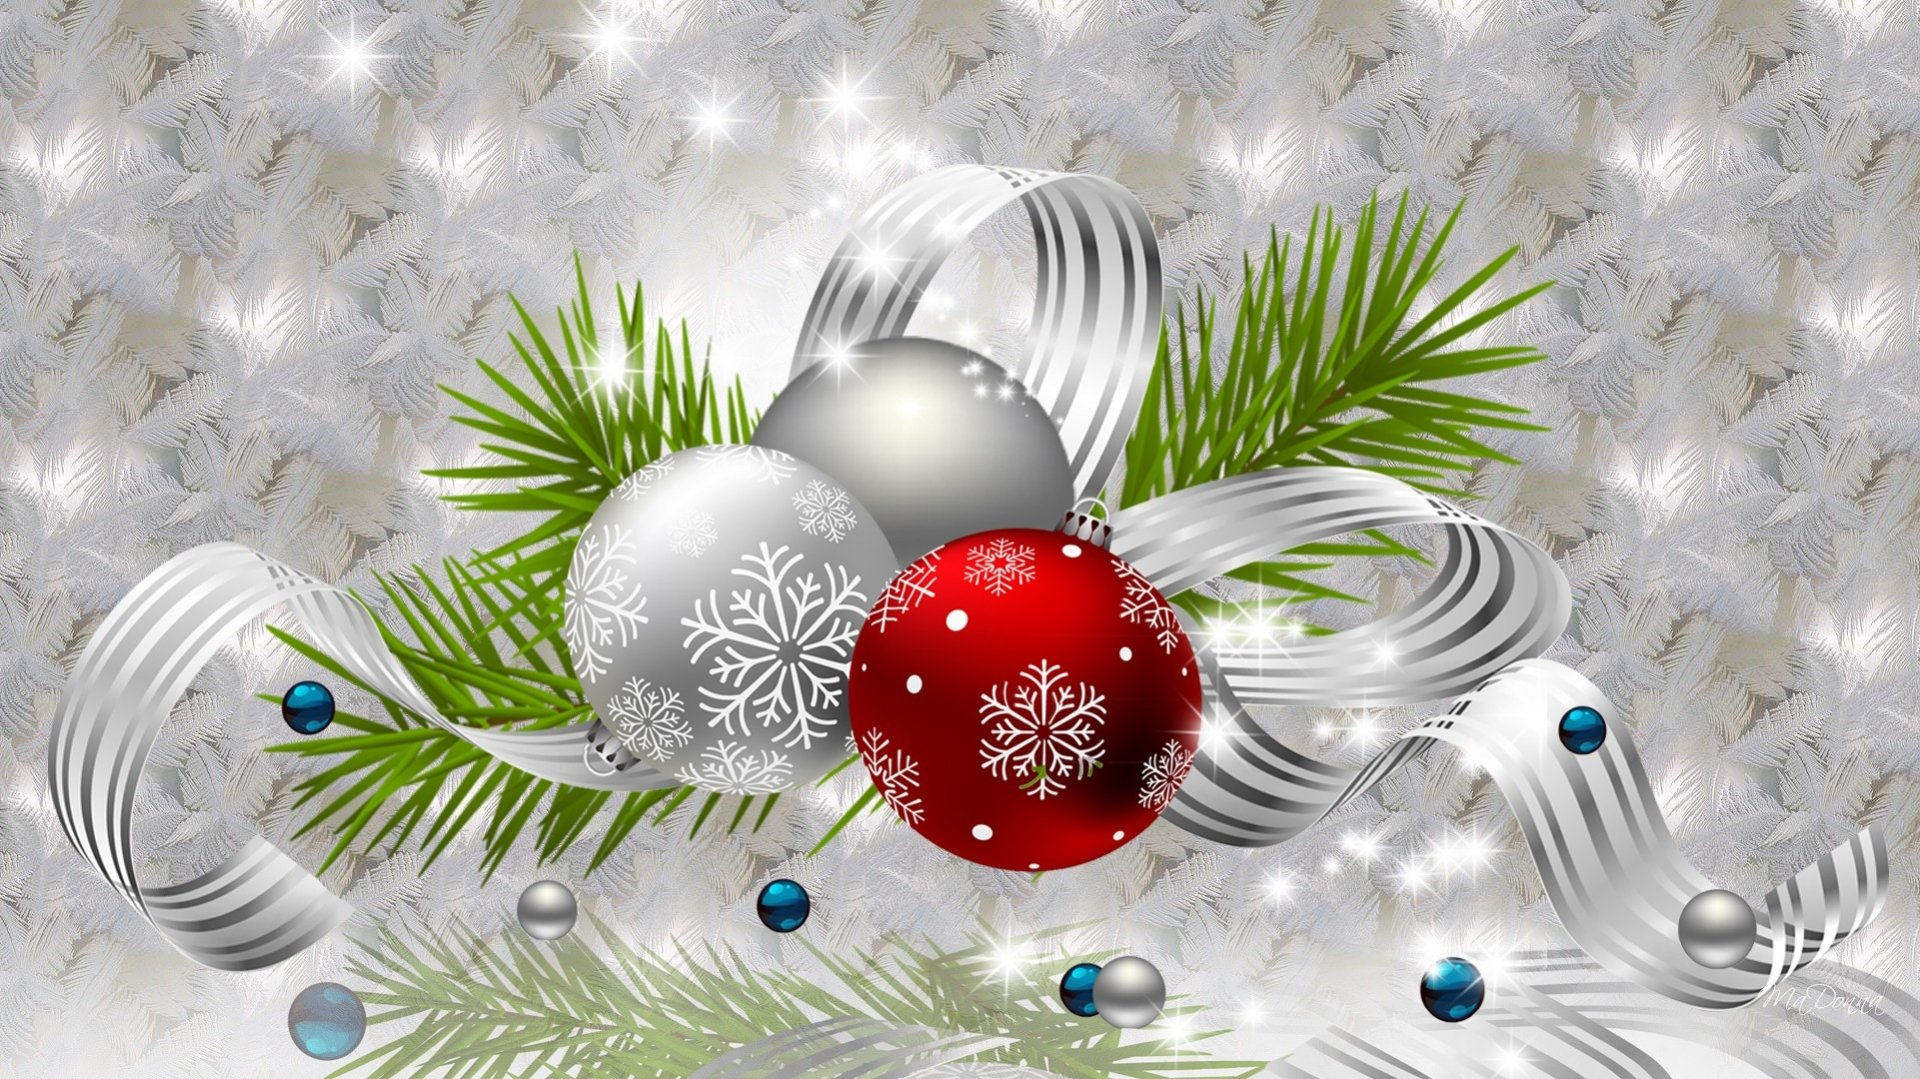 christmas ornaments wallpaper 8026 - photo #18